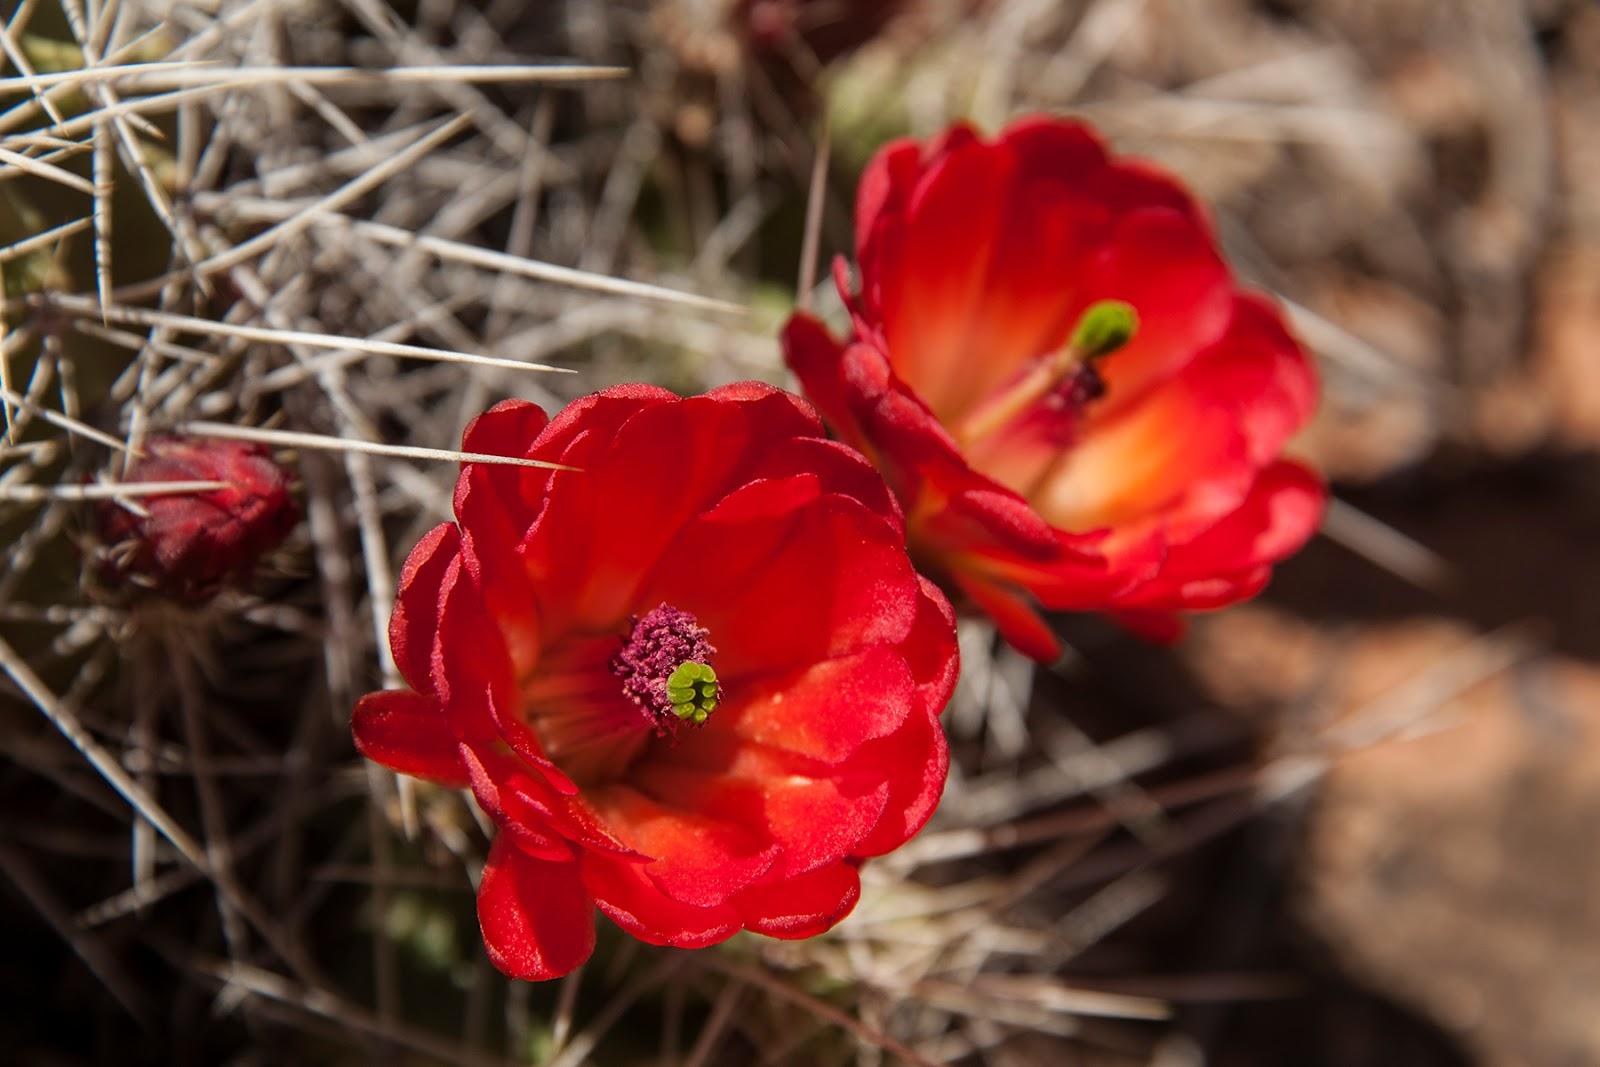 The Booby Hatcher: Cedar Mesa Flowers